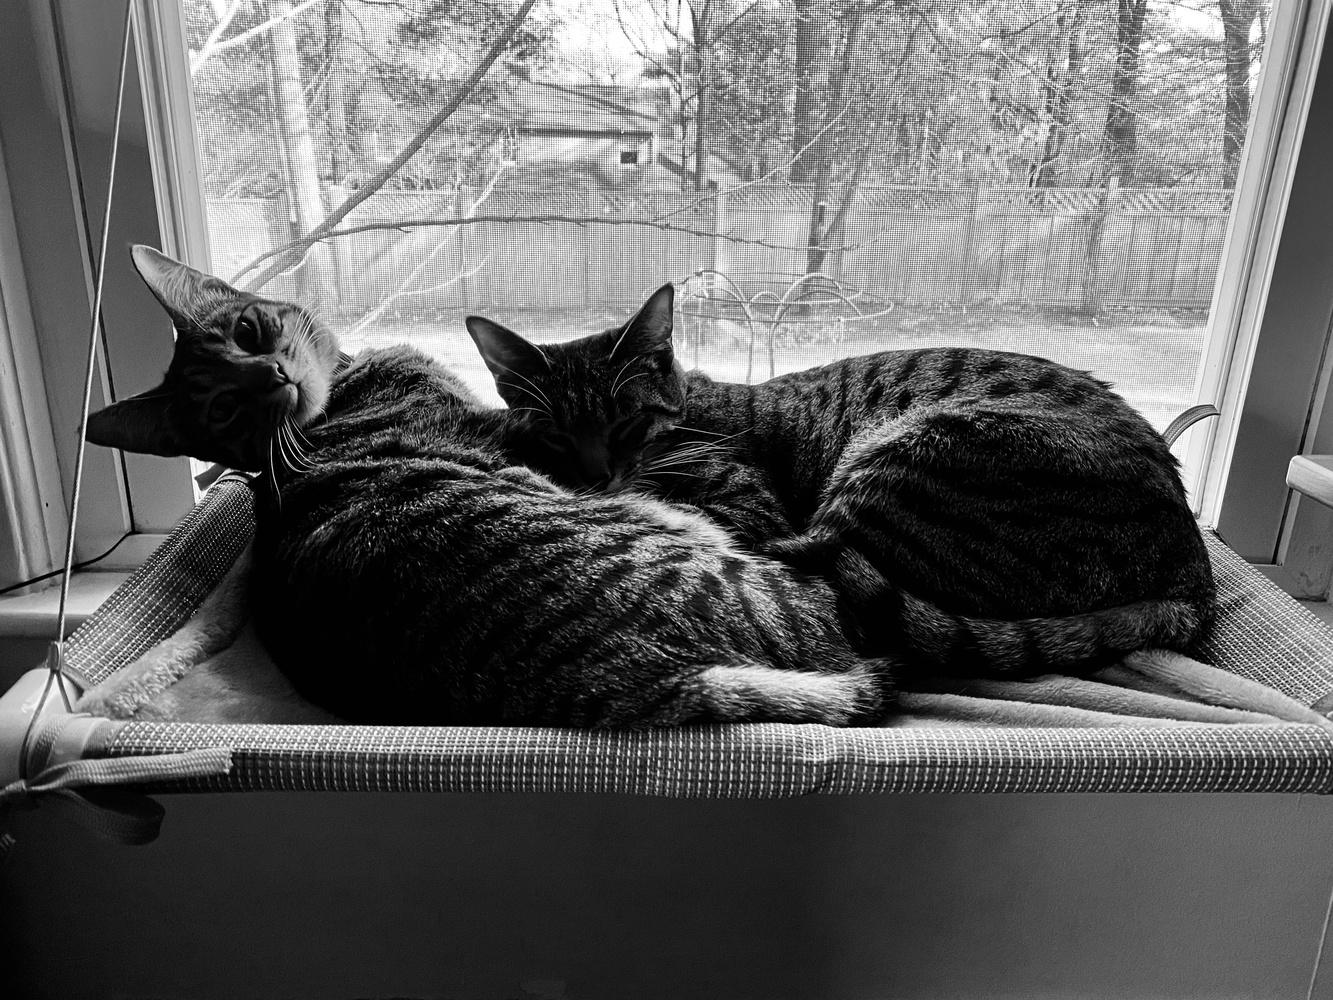 Jiji and Kiki by a window.